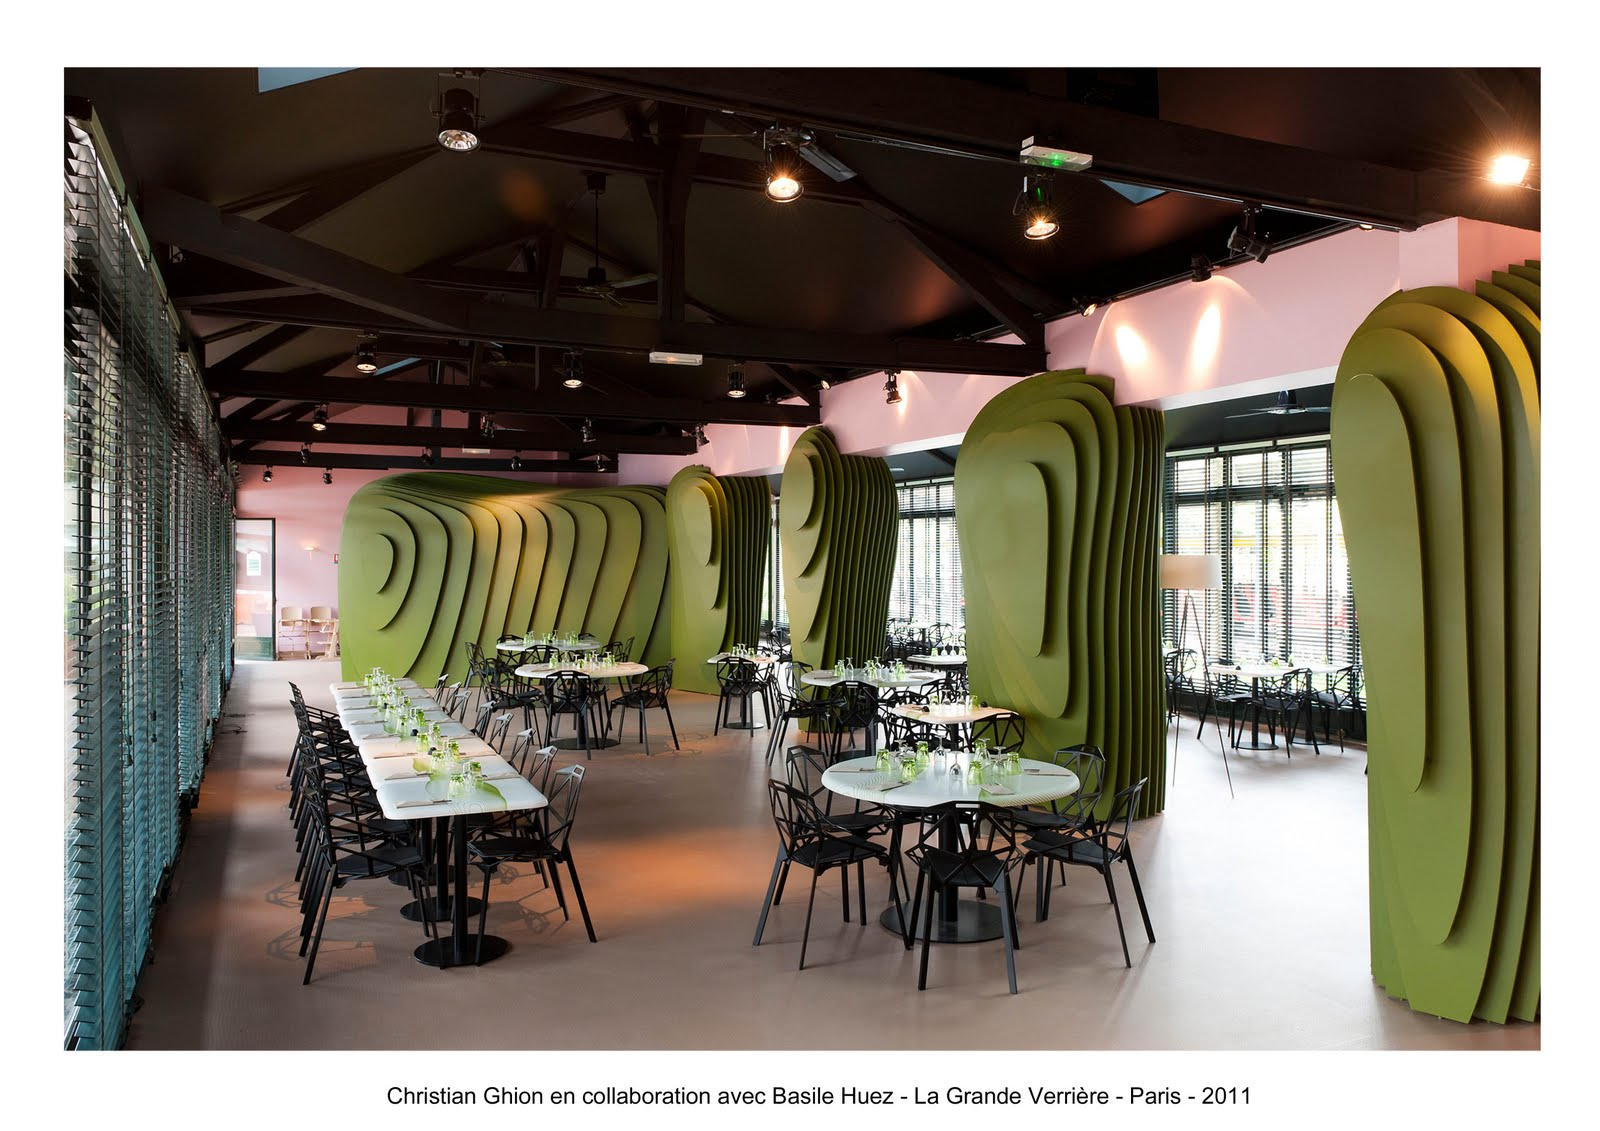 Basile huez design collaborations restaurant la - Restaurant jardin d acclimatation neuilly ...